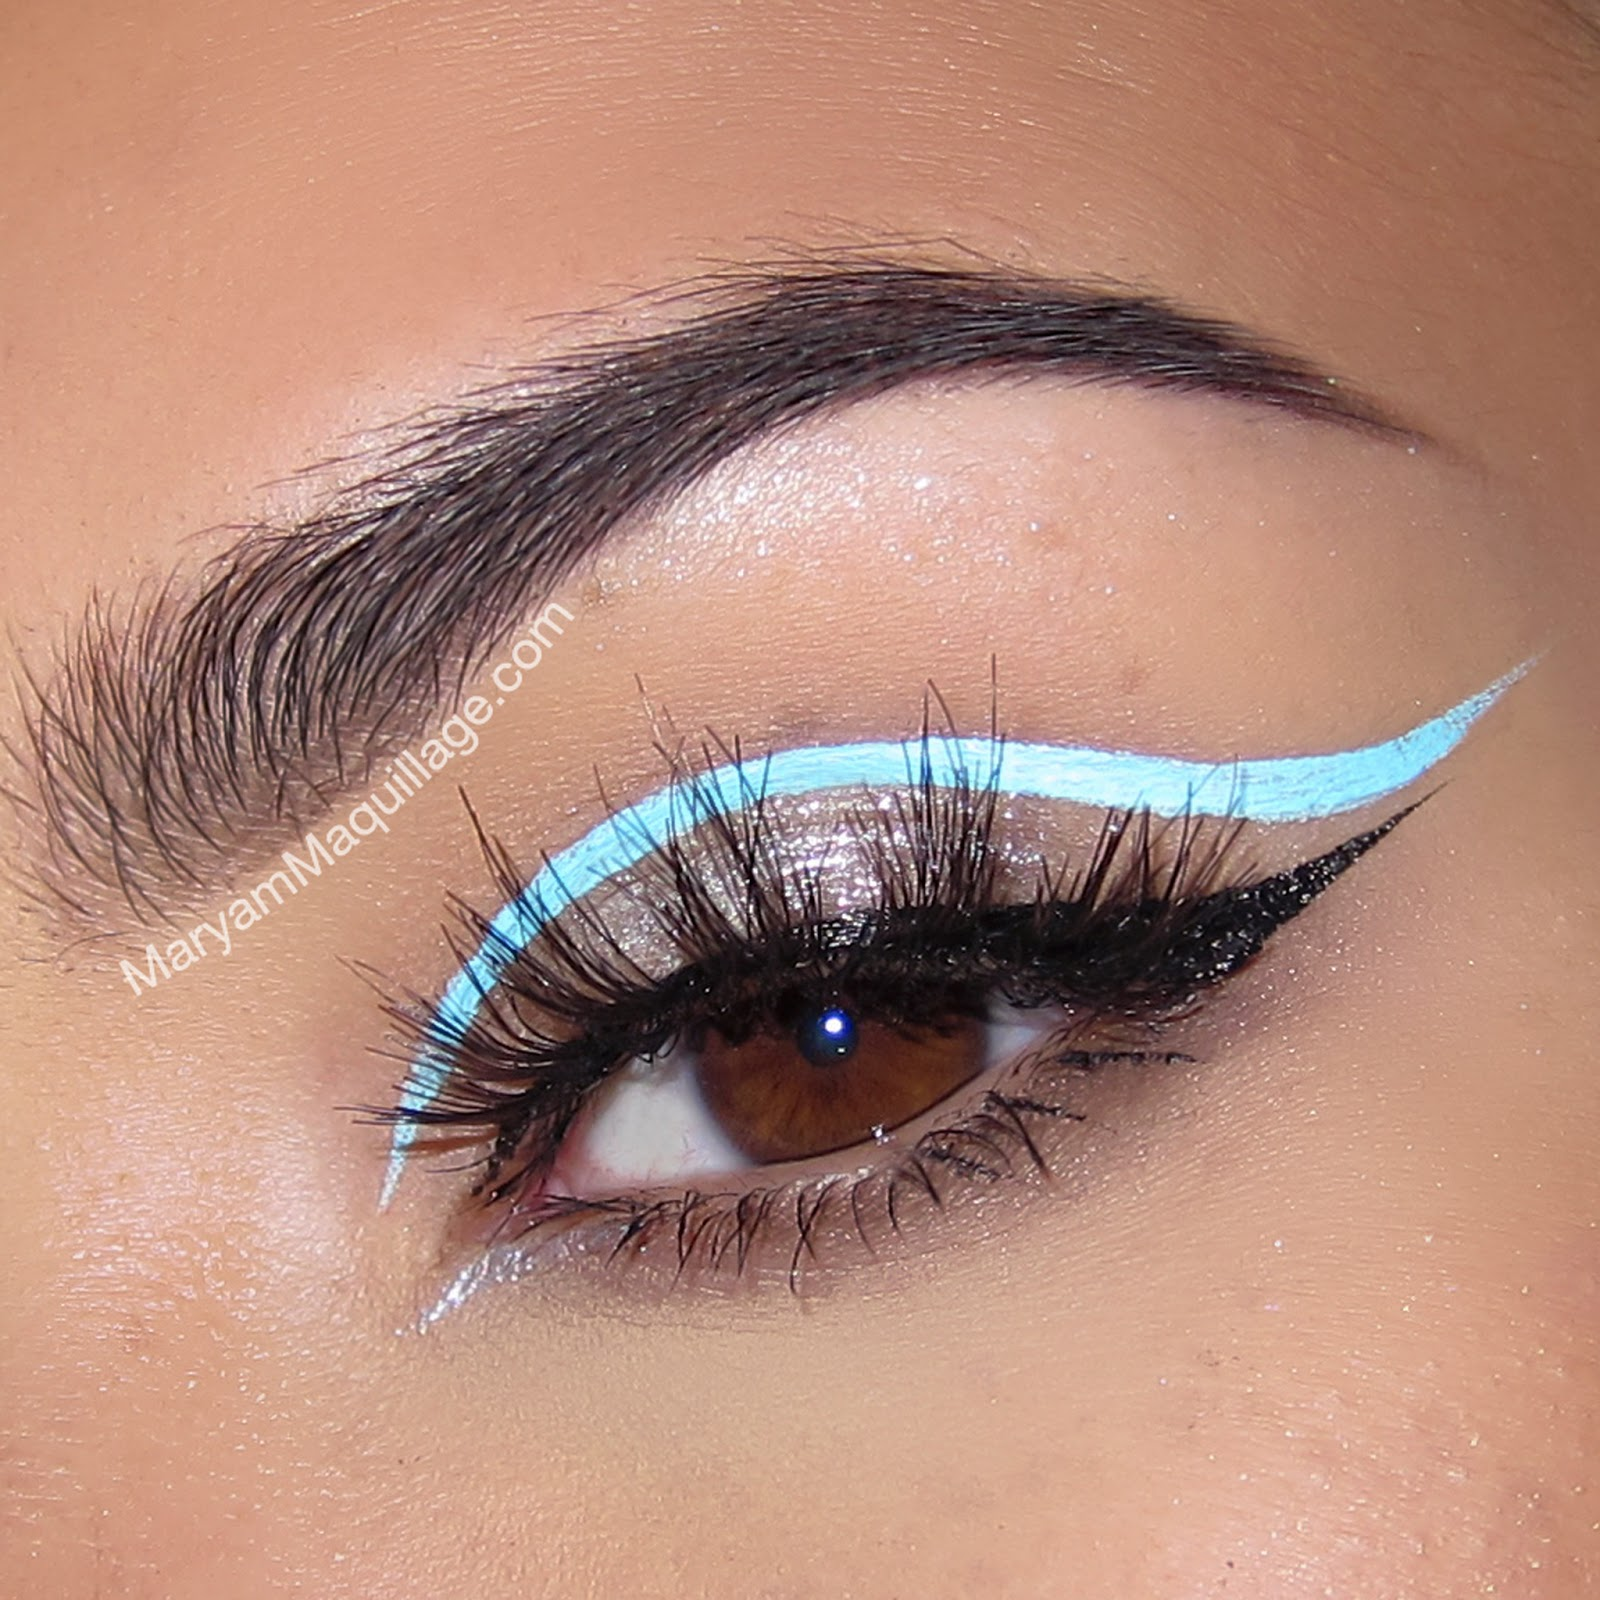 Maryam Maquillage Mod N Modern Makeup Summer Style